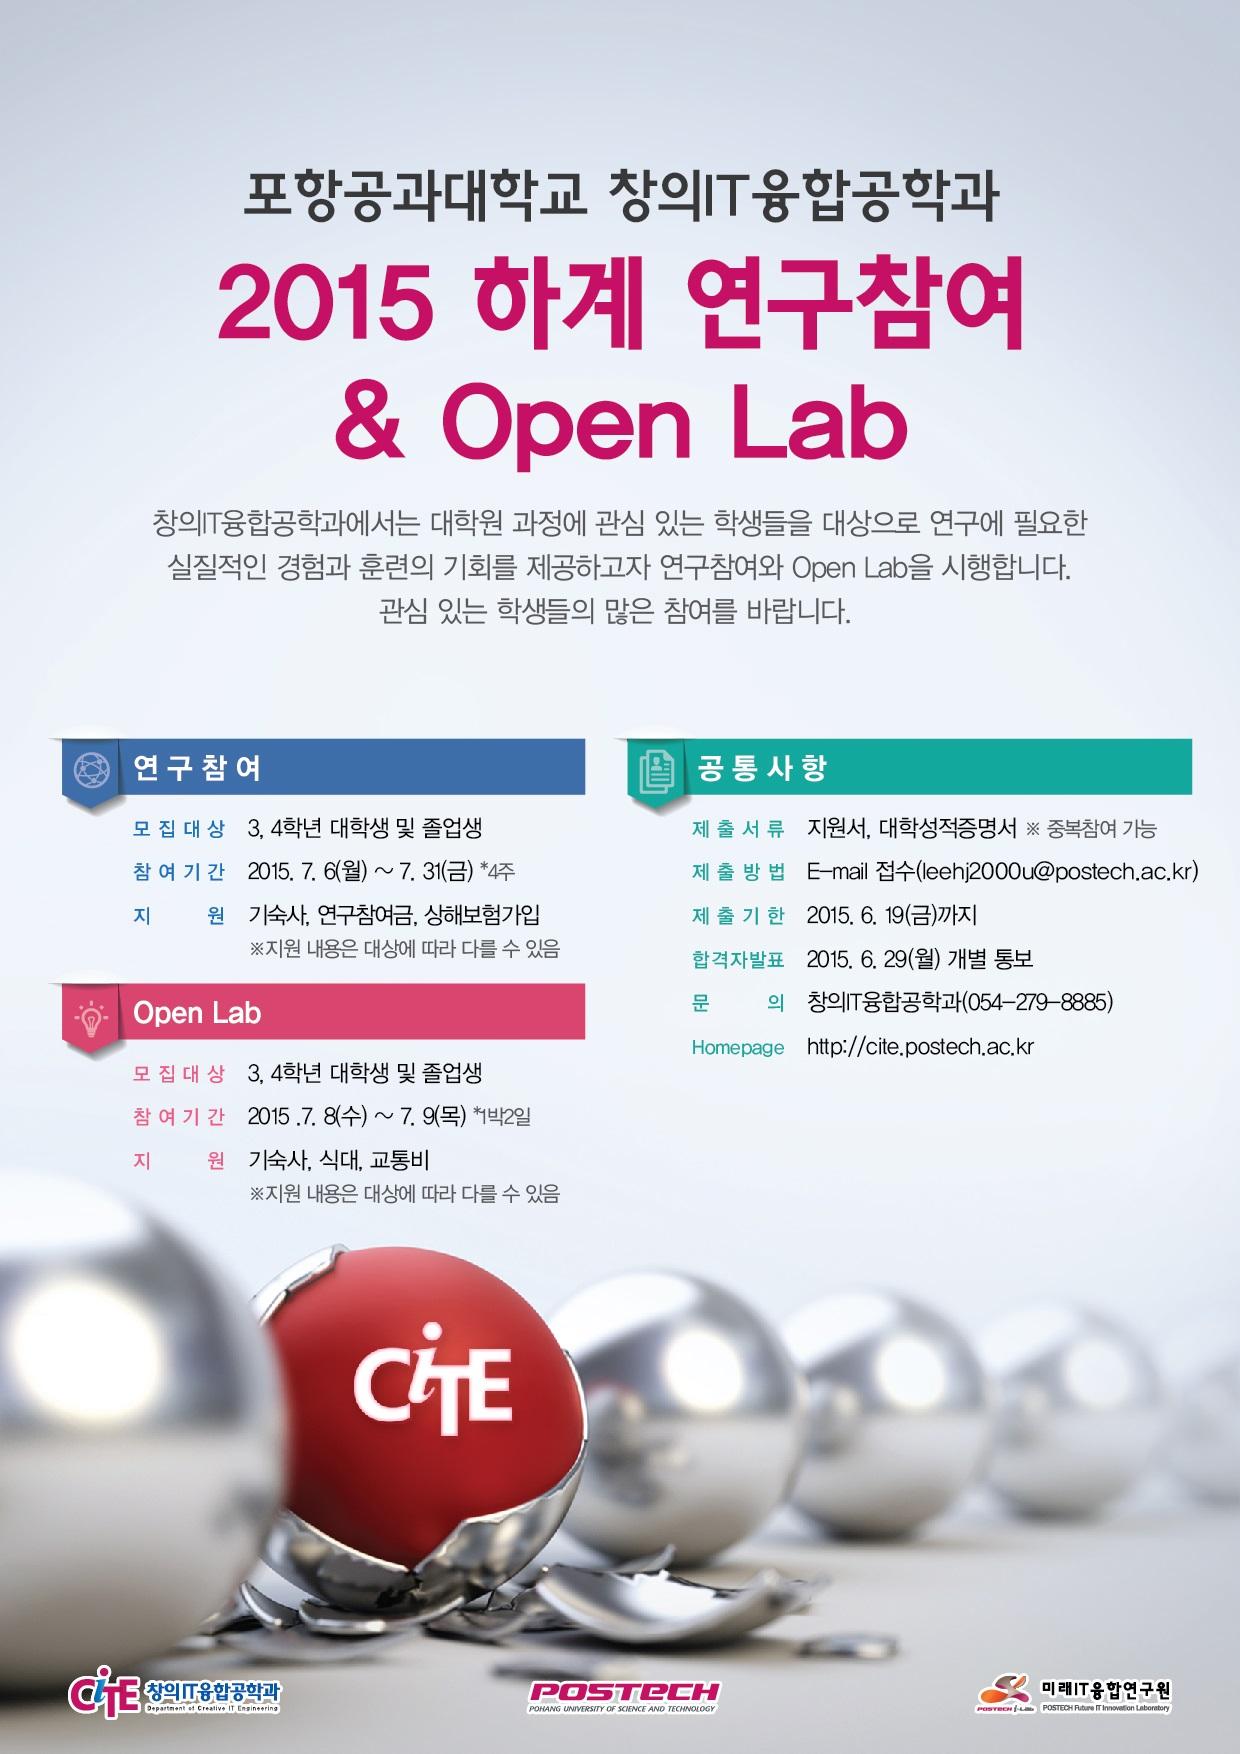 [CiTE]2015 창의IT융합공학과 하계 연구참여 & Open Lab 시행